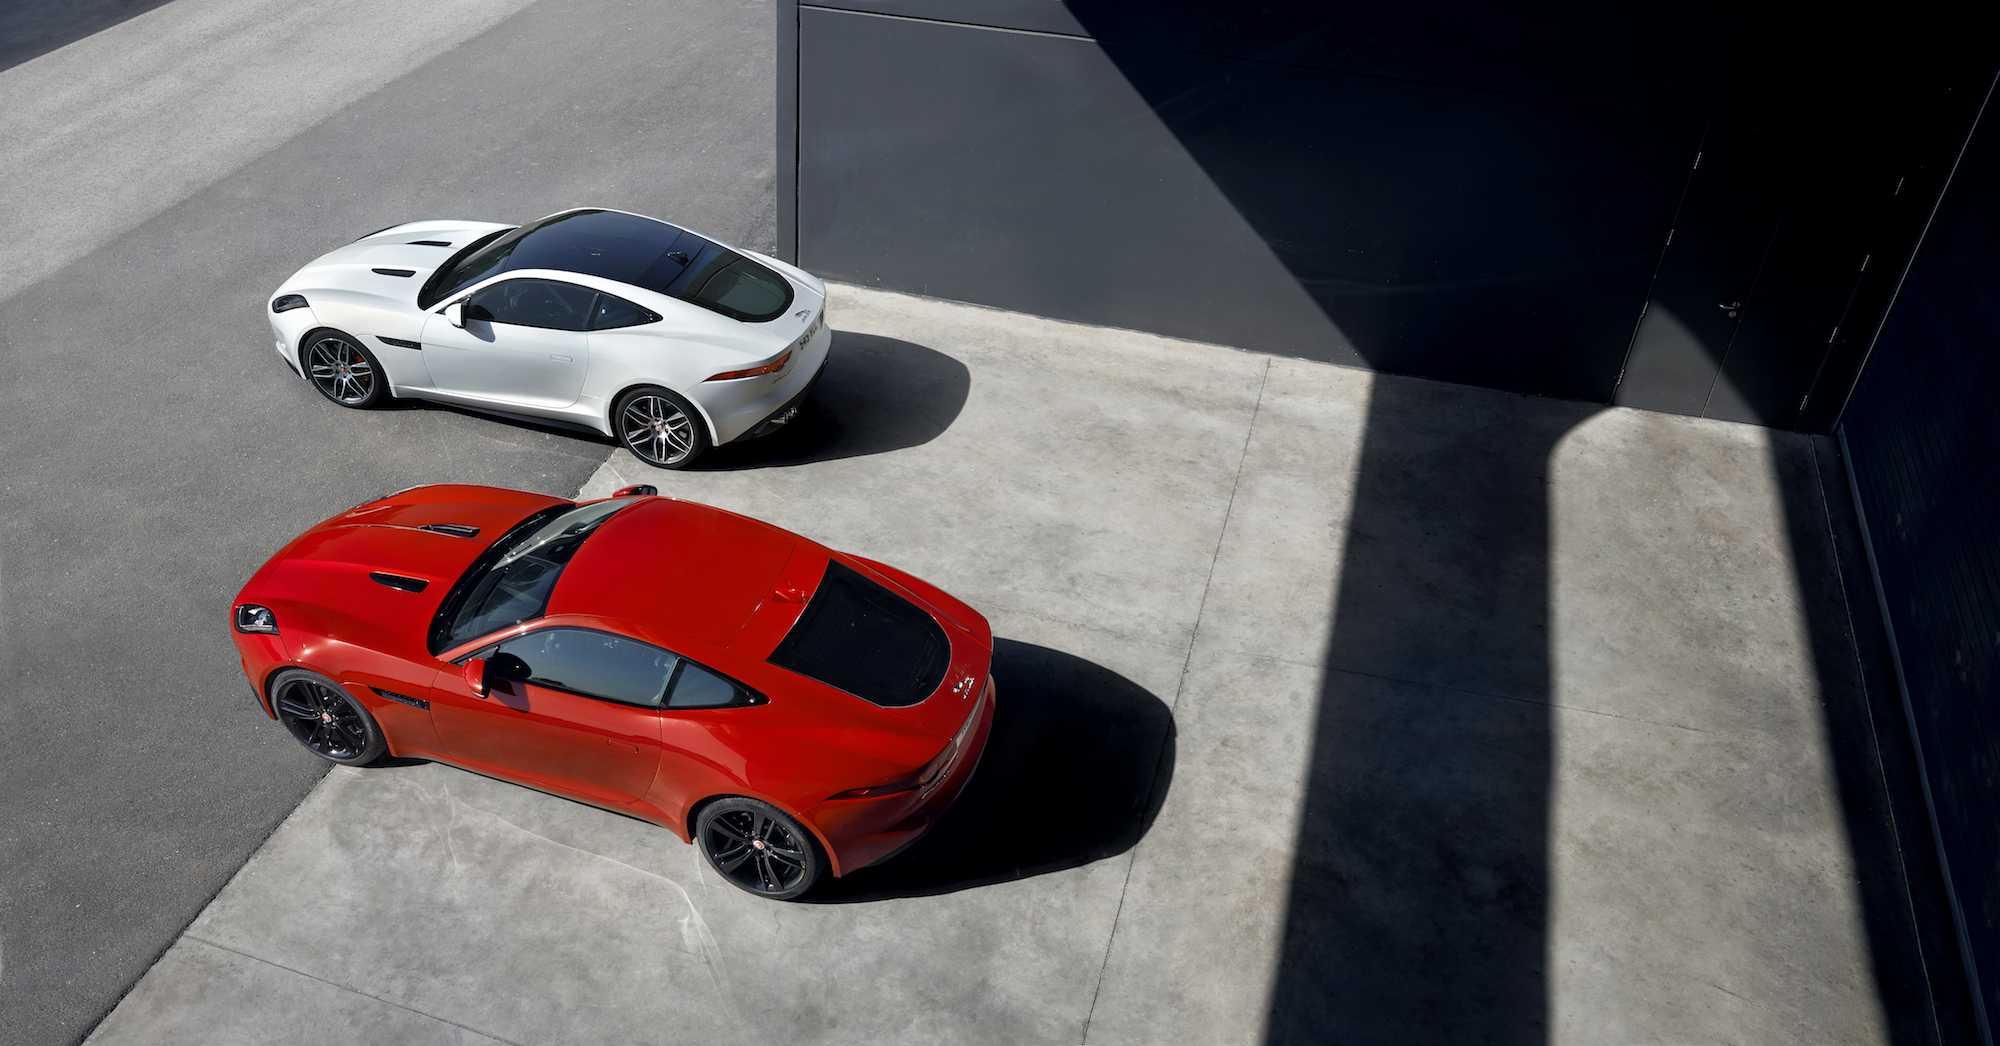 Обновленный jaguar f-type 2019-2020 цена, технические характеристики, фото, видео тест-драйв